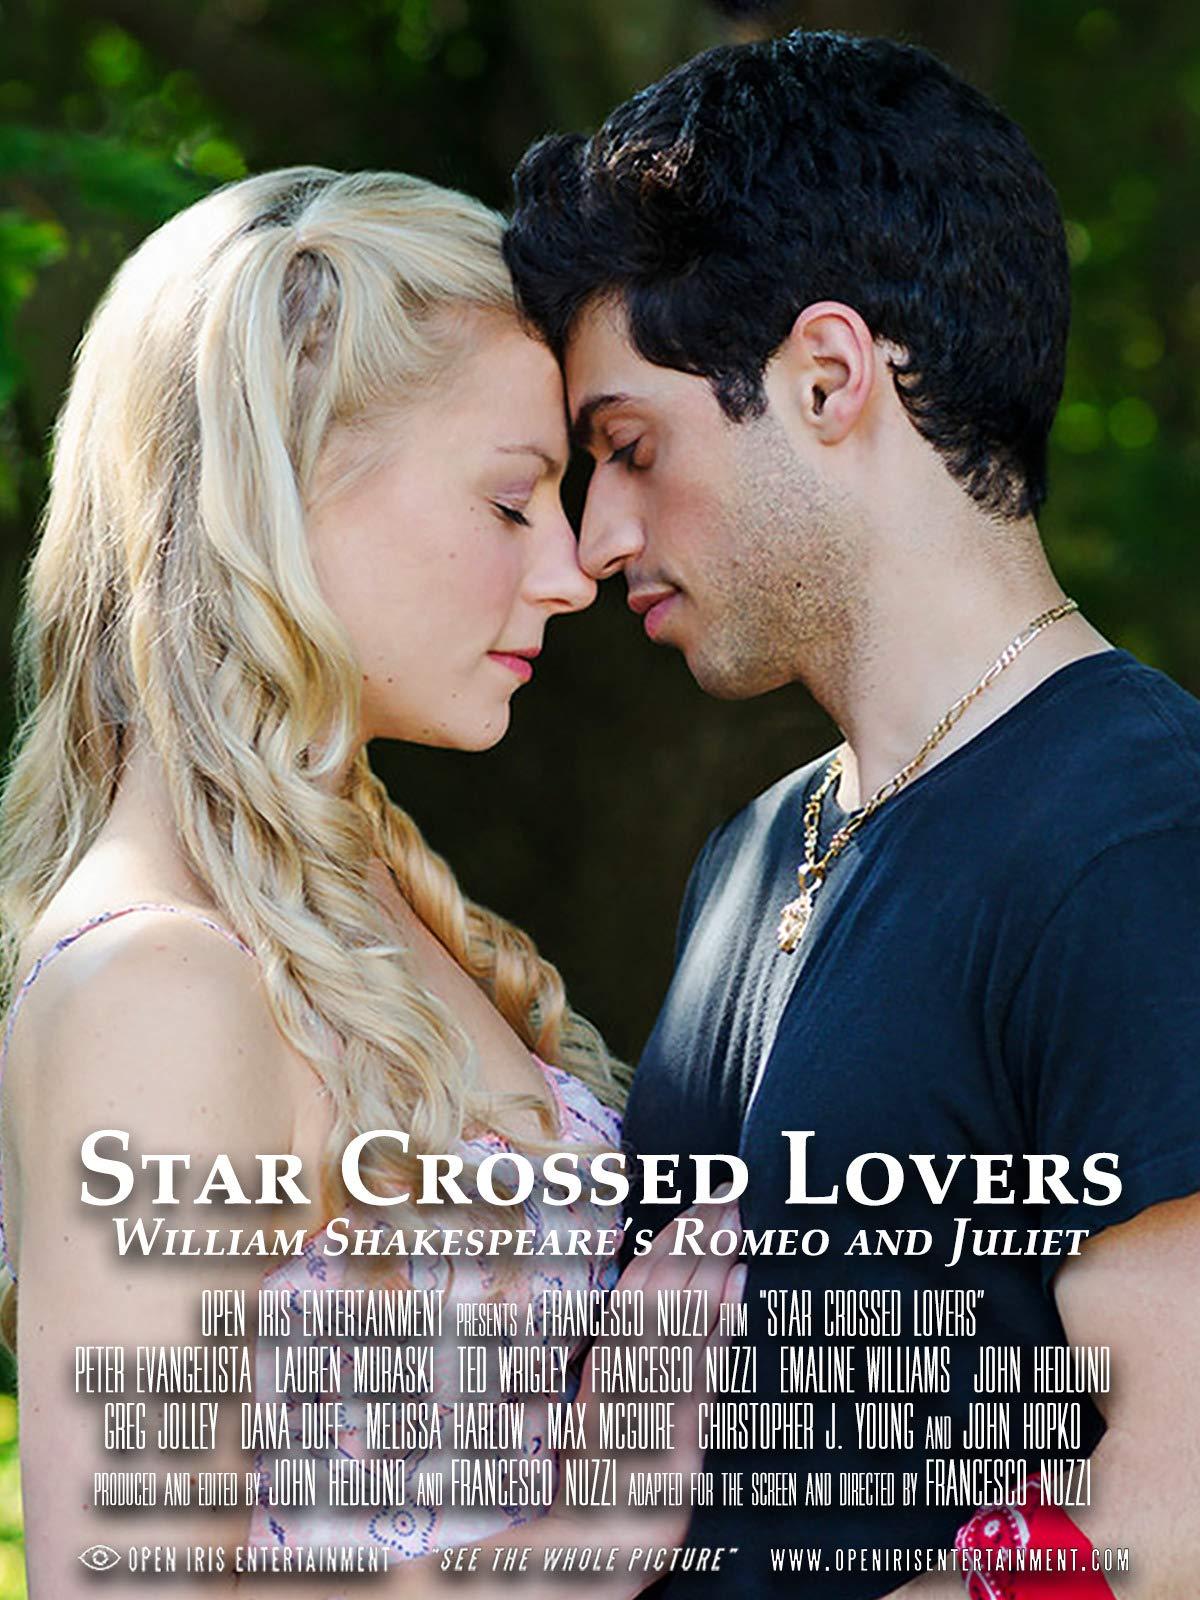 Star Crossed Lovers - William Shakespeare's Romeo and Juliet